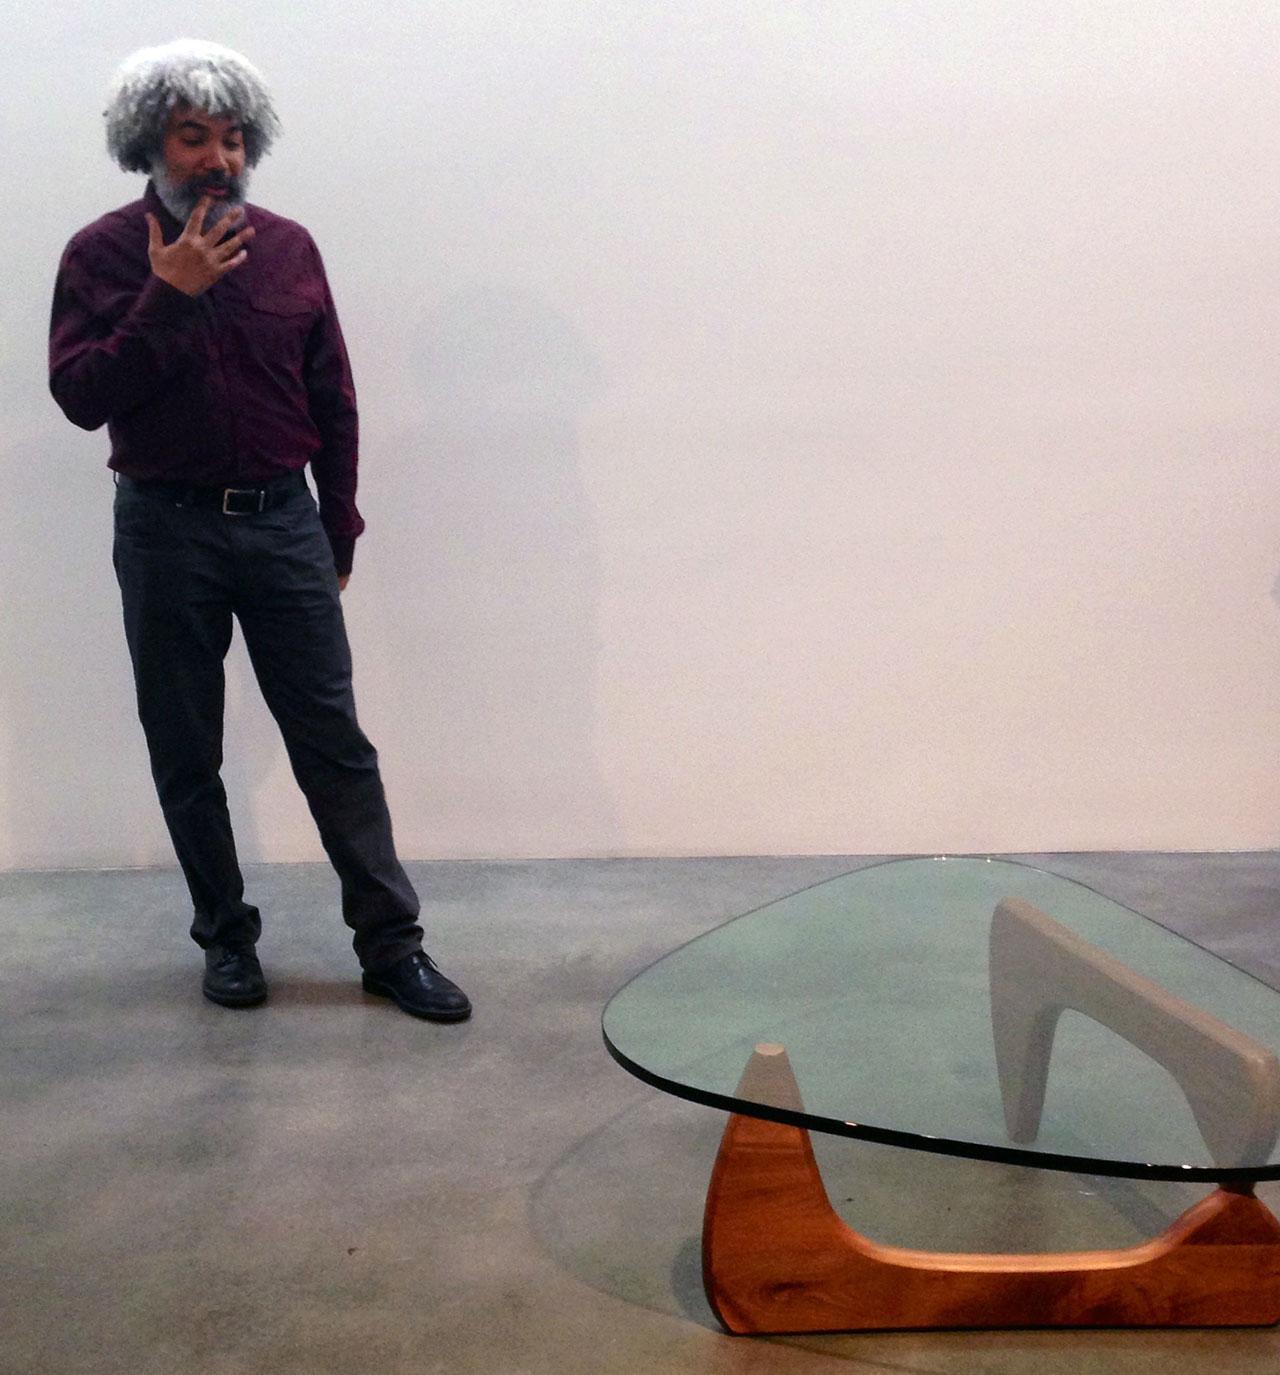 Wilson discussing Noguchi's work (click to enlarge)